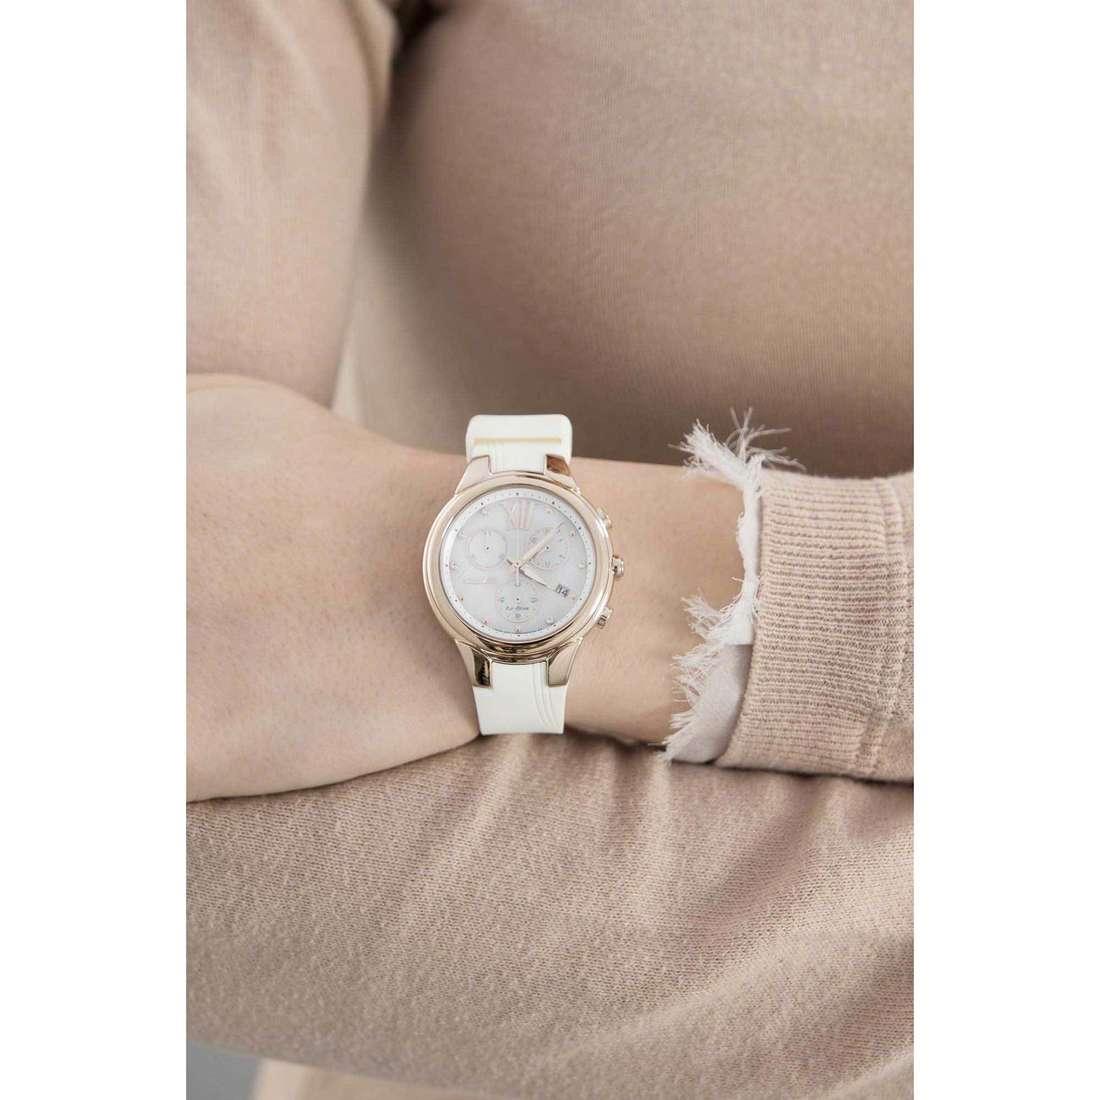 Citizen chronographes Eco-Drive femme FB1313-03A indosso